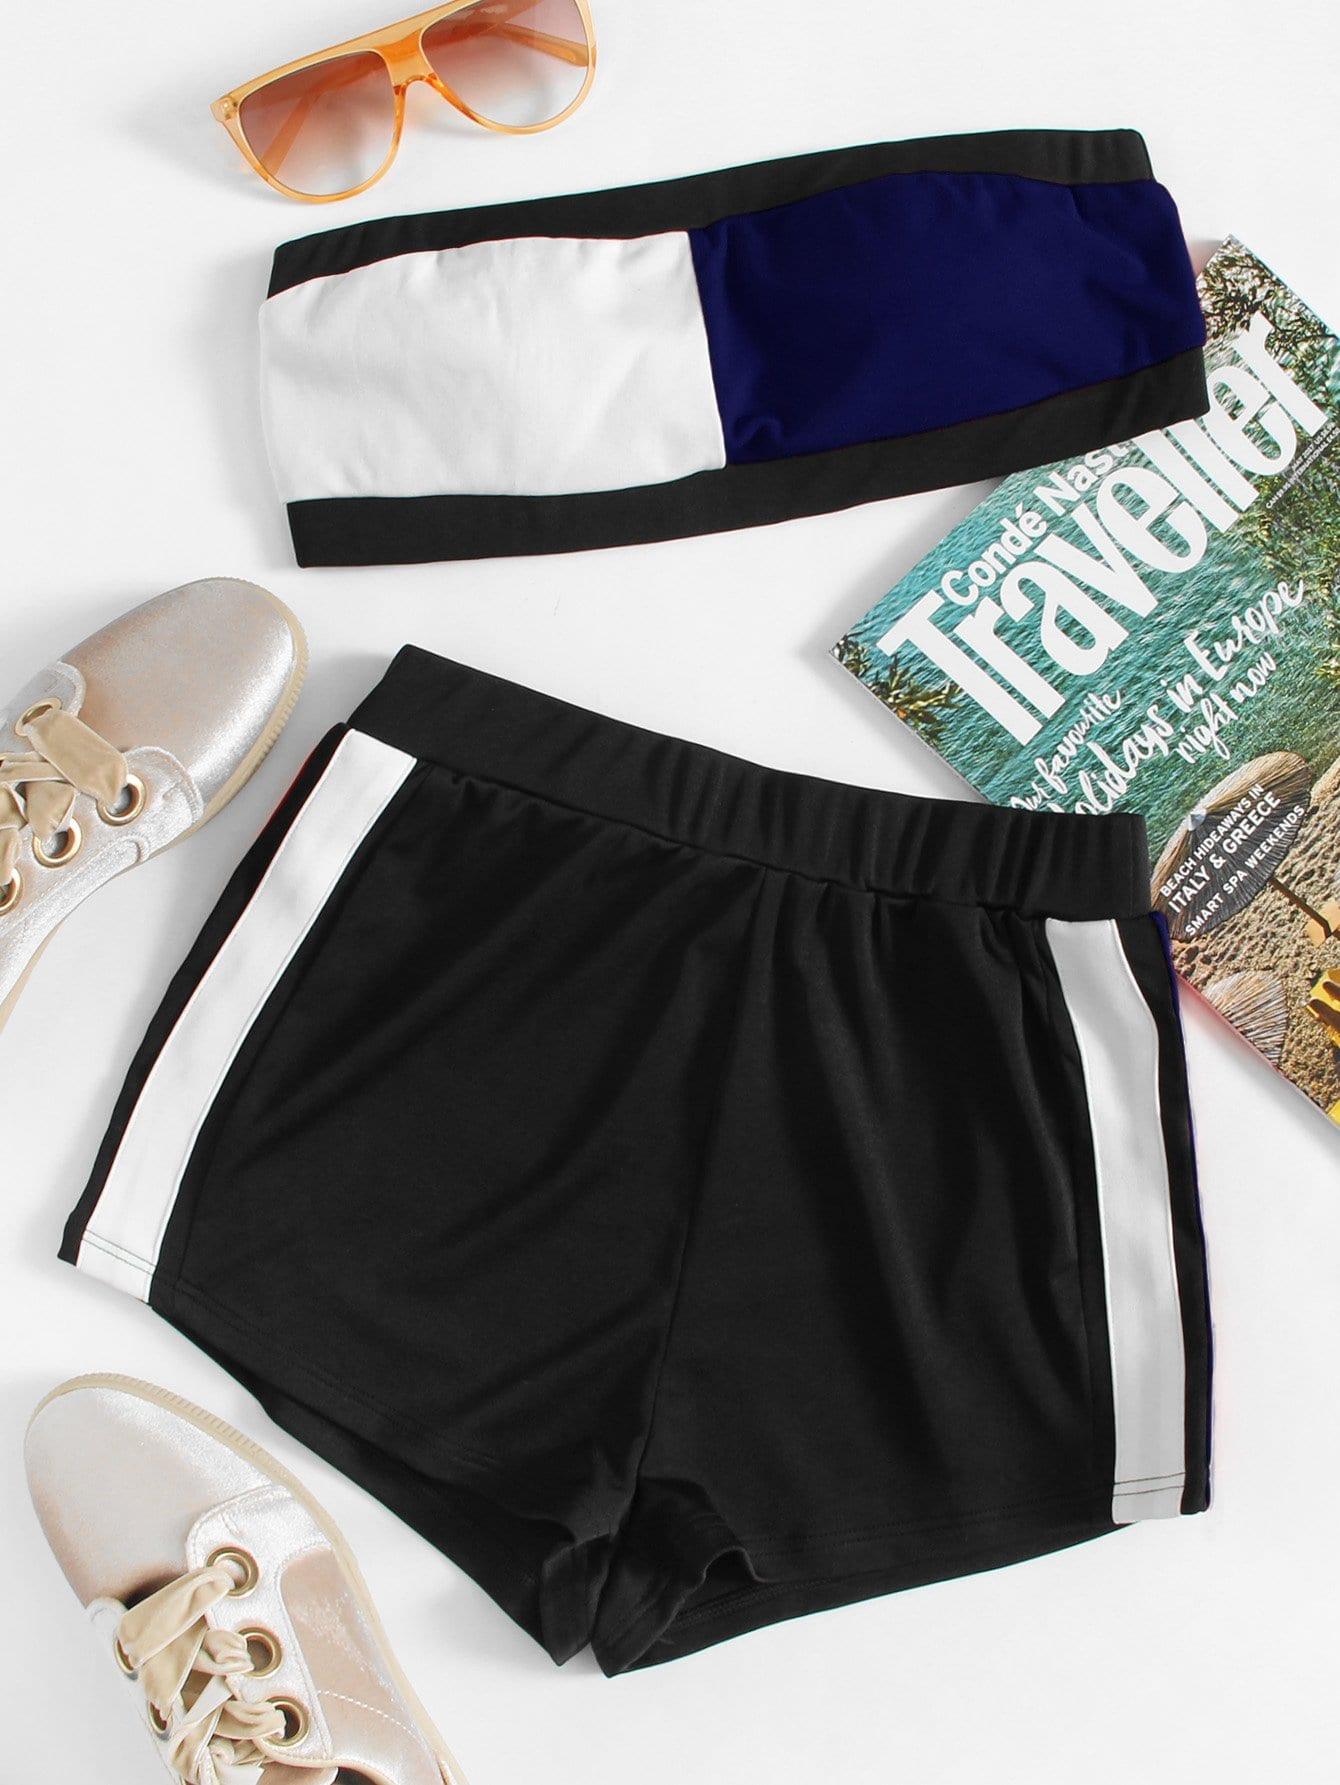 Colorblock Crop Bandeau Top With Shorts black choker sleeveless crop top